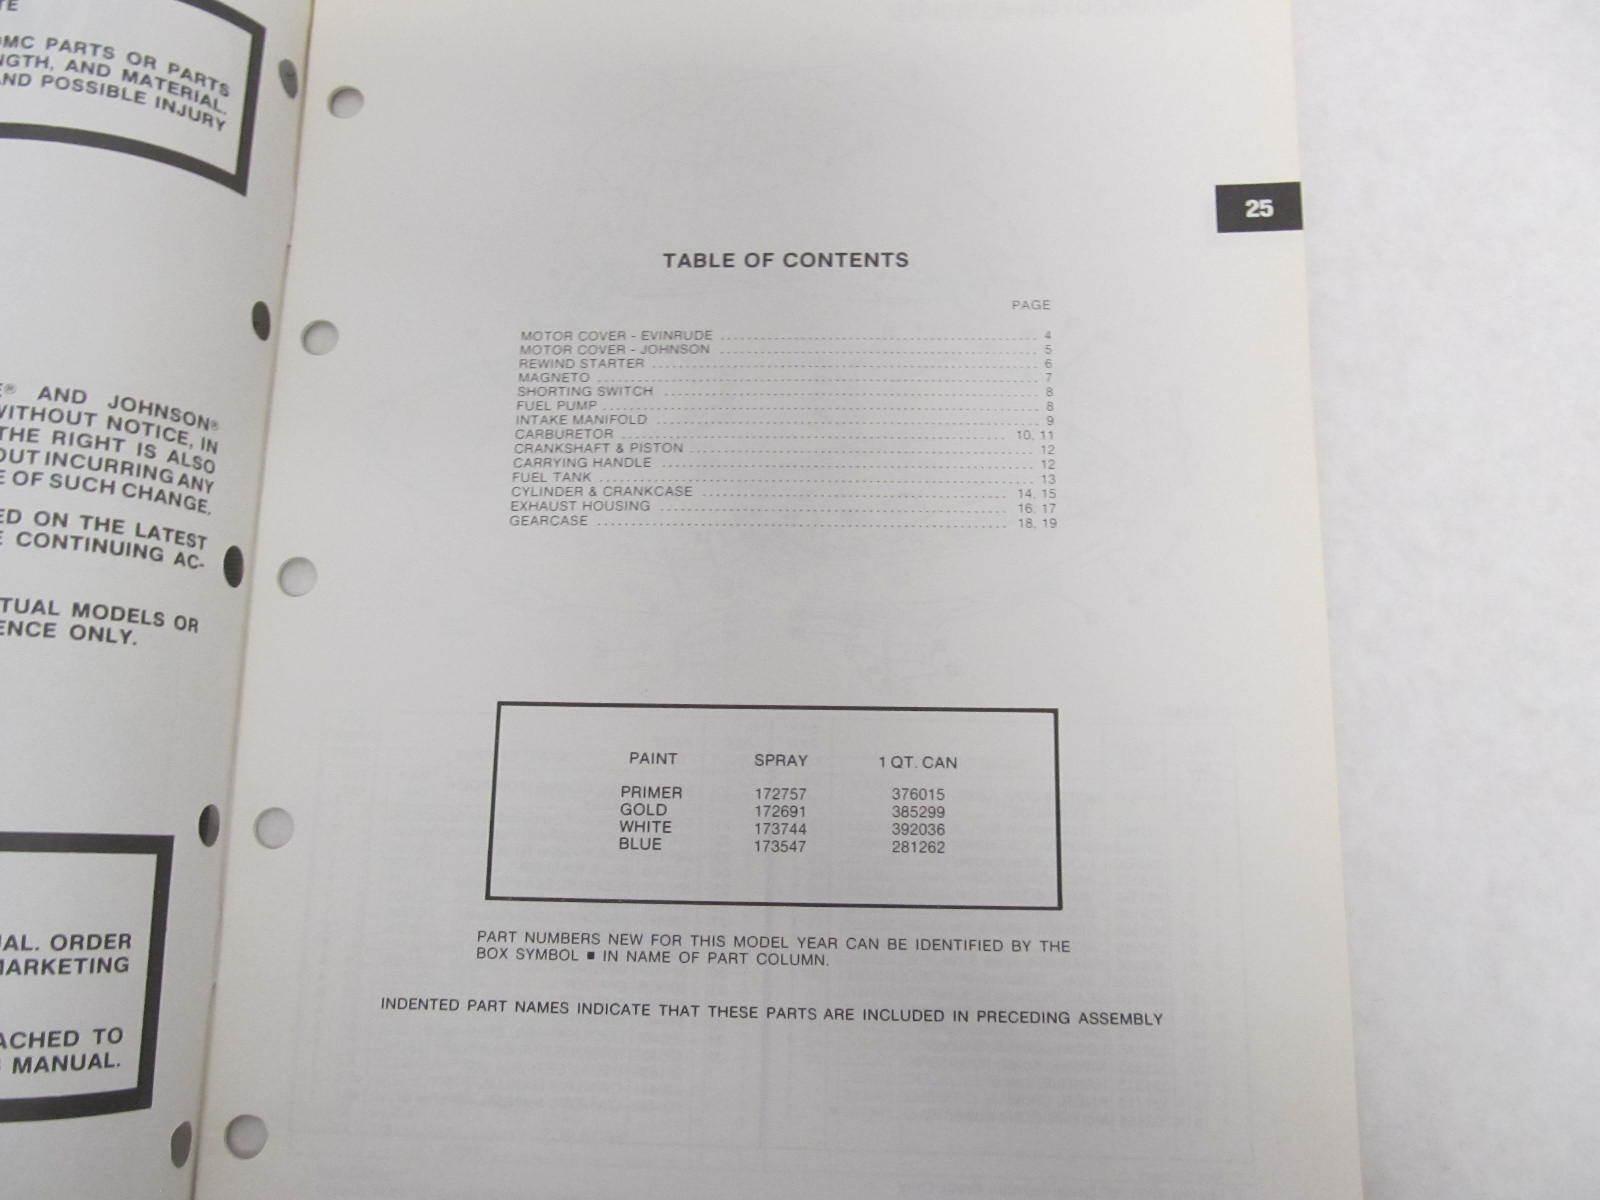 392974 OMC Evinrude Johnson 1982 Outboard 25 HP Parts Catalog